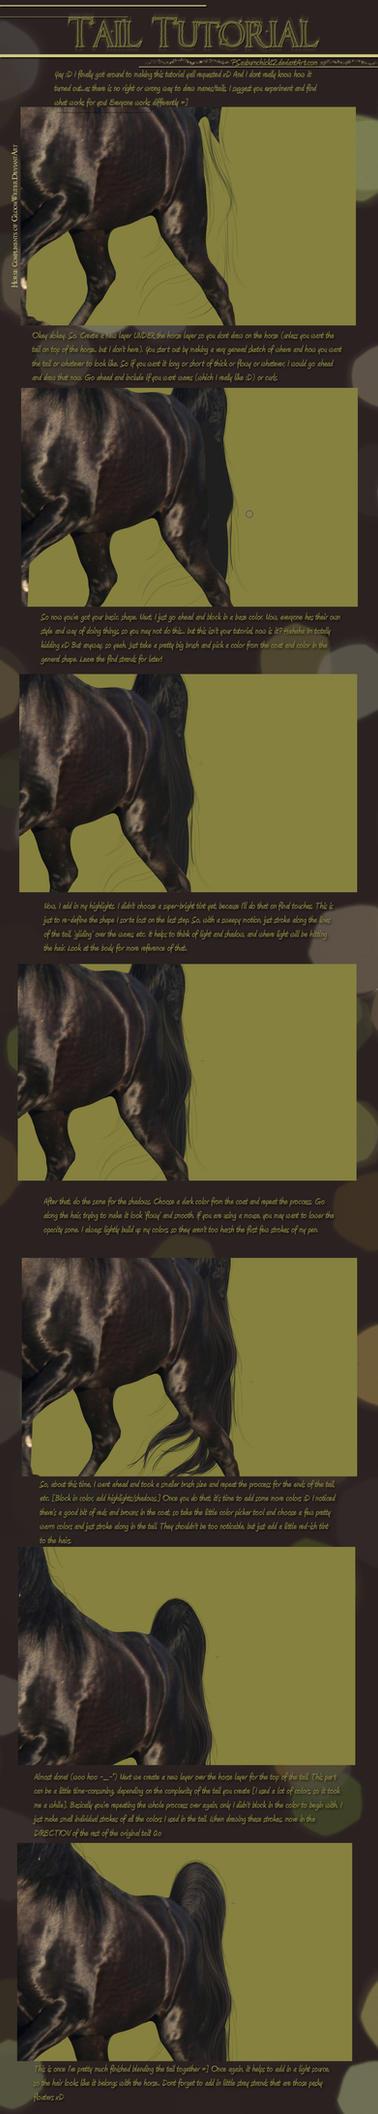 Tail Tutorial by PSauburnchick12